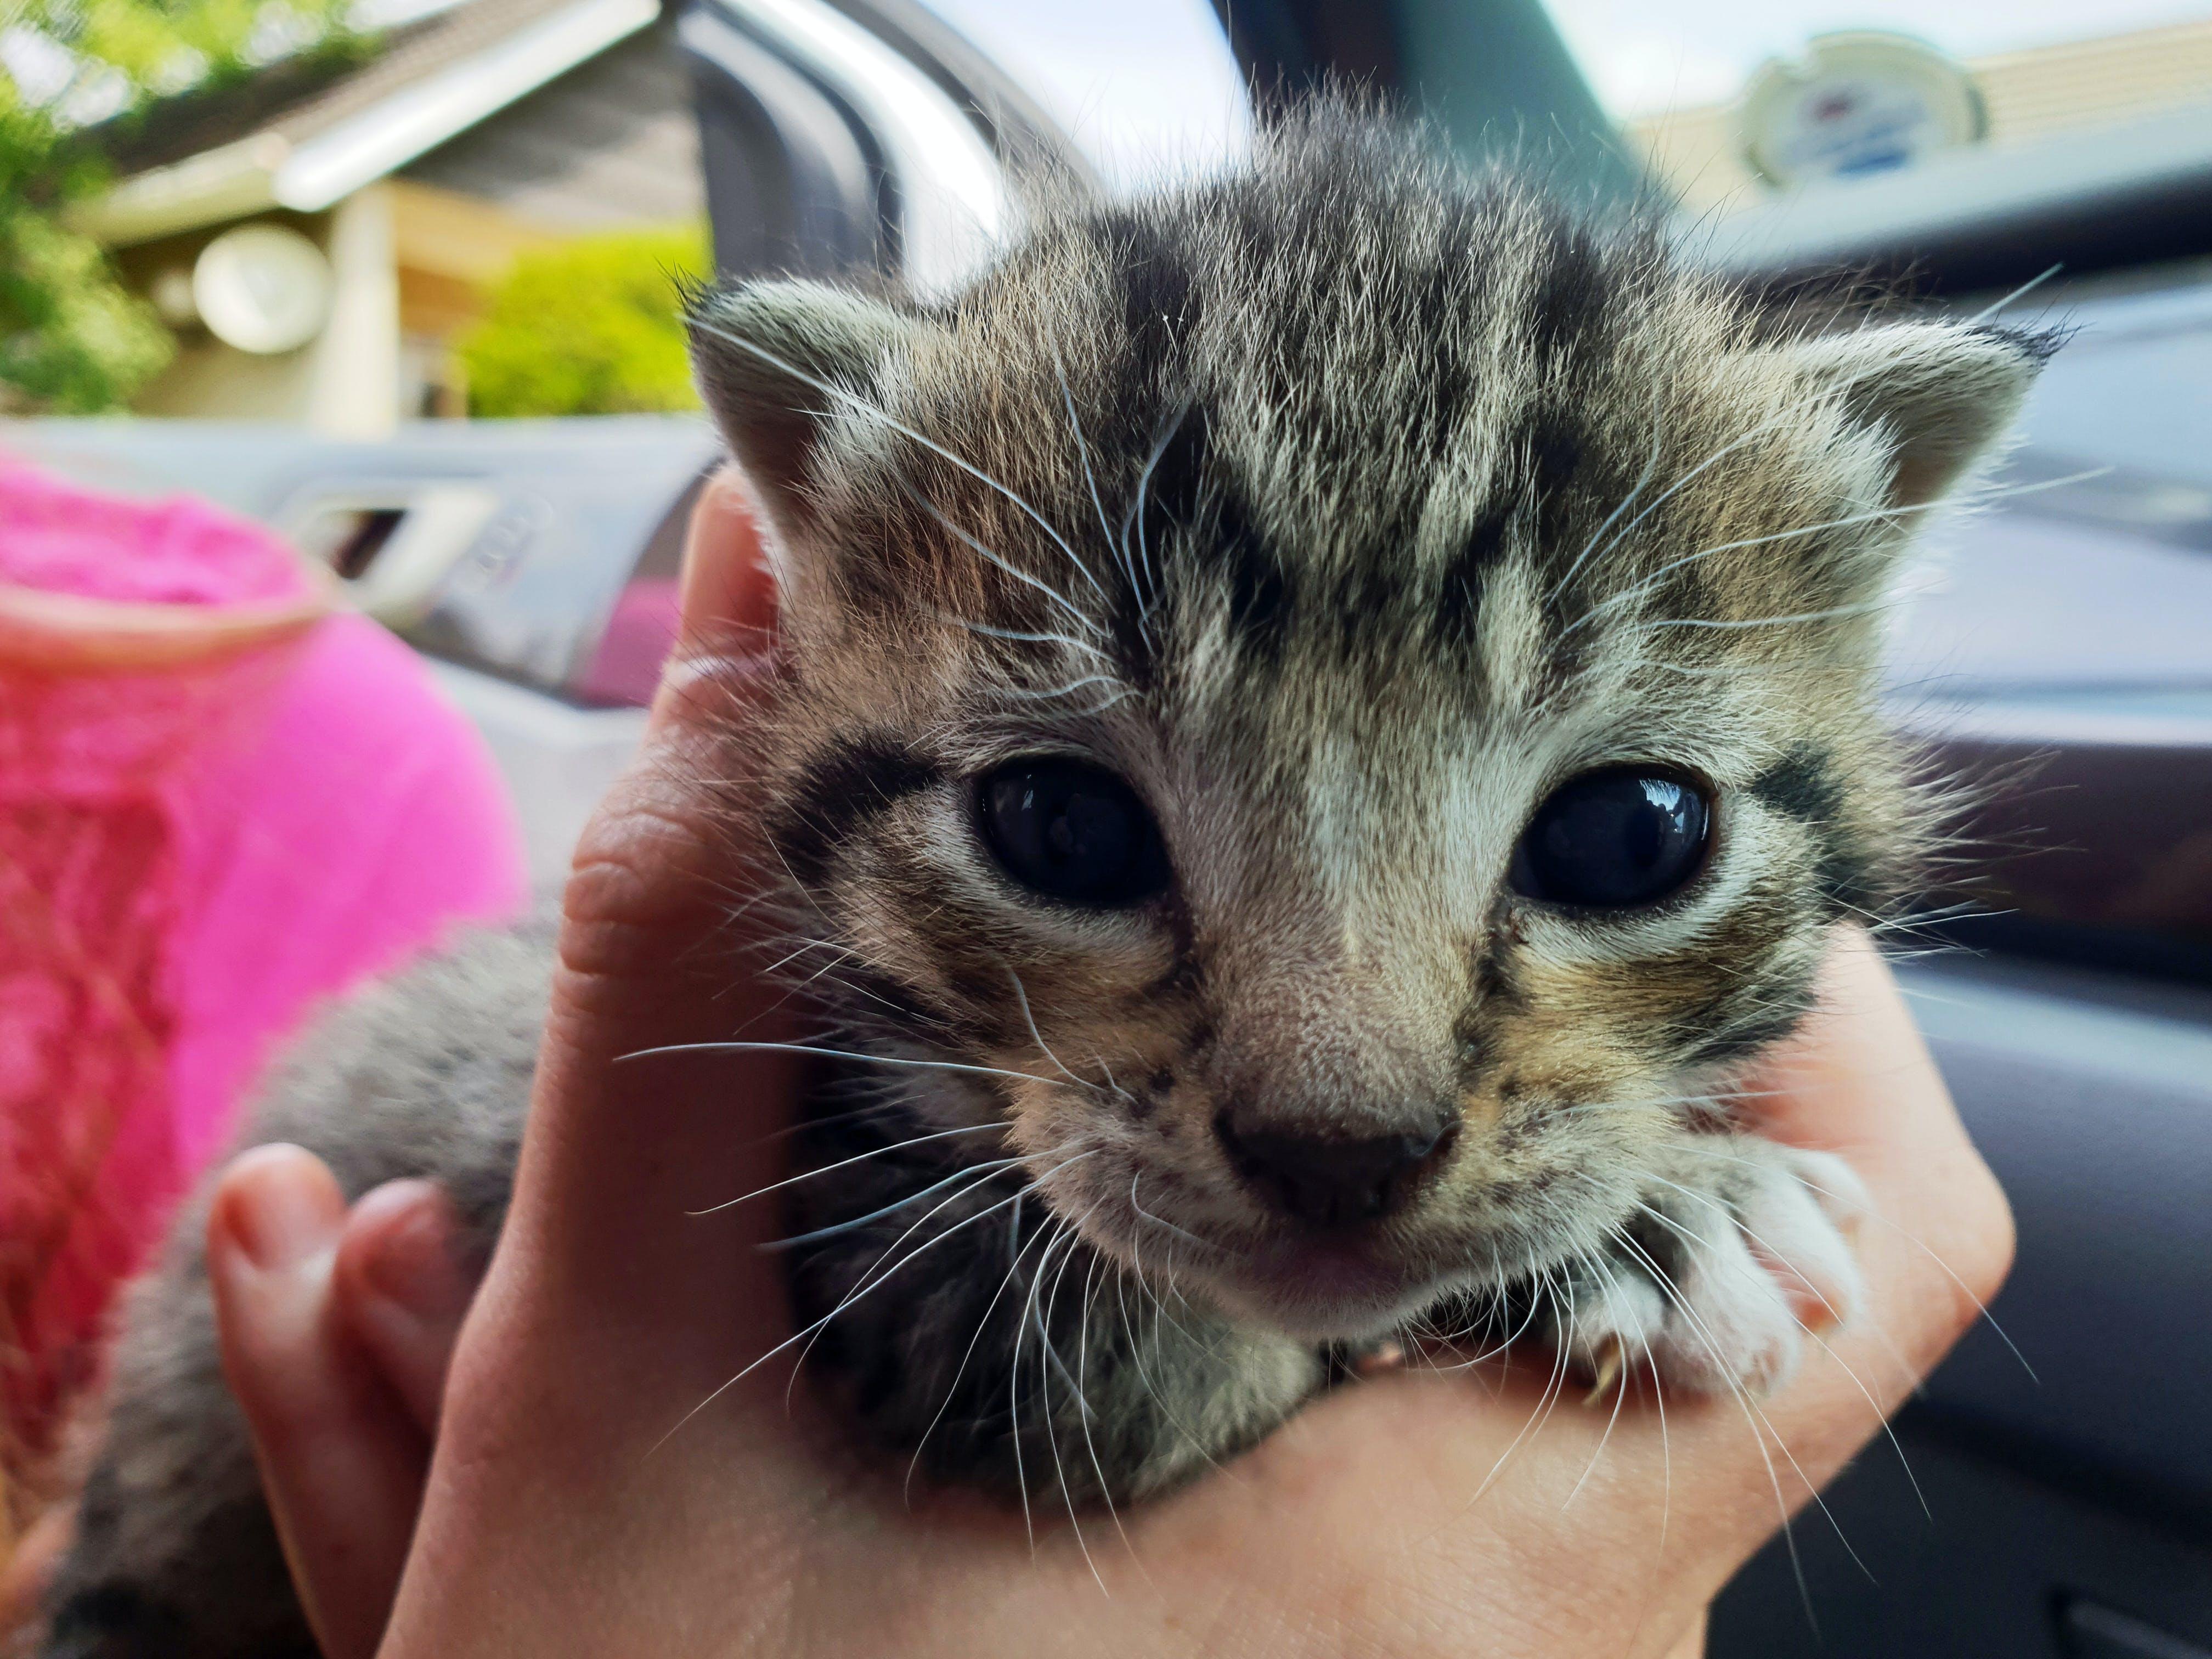 Closeup Photography of Short-fur Brown and Black Kitten